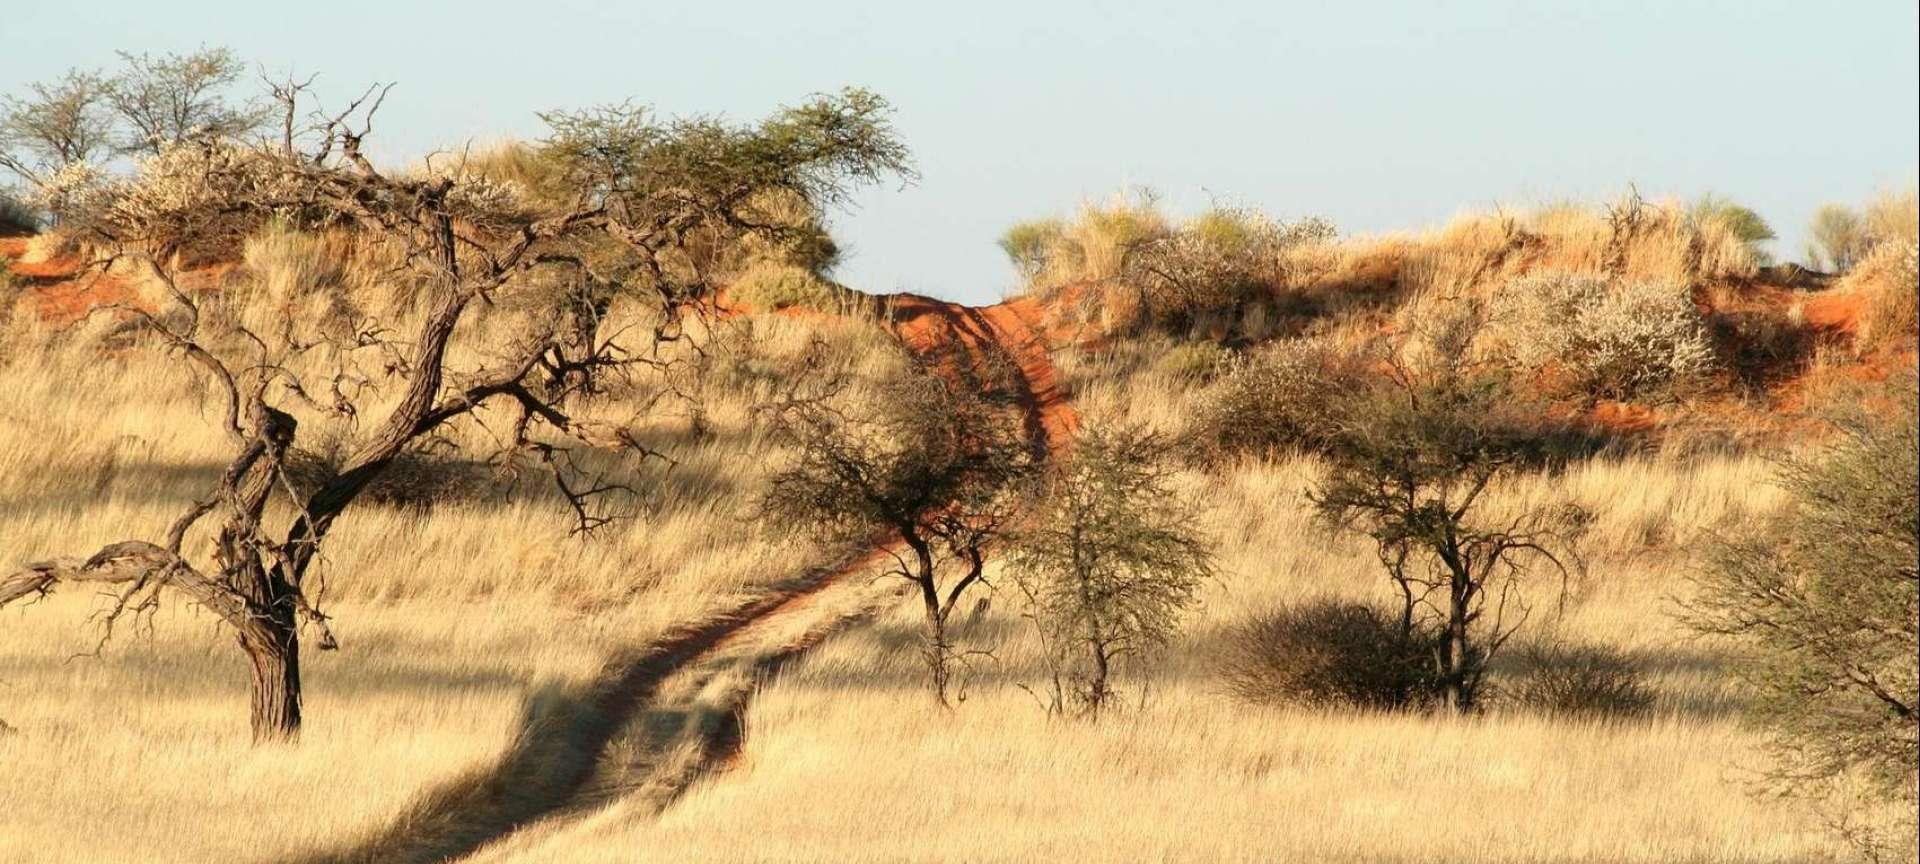 Kalahari Desert - Africa Wildlife Safaris